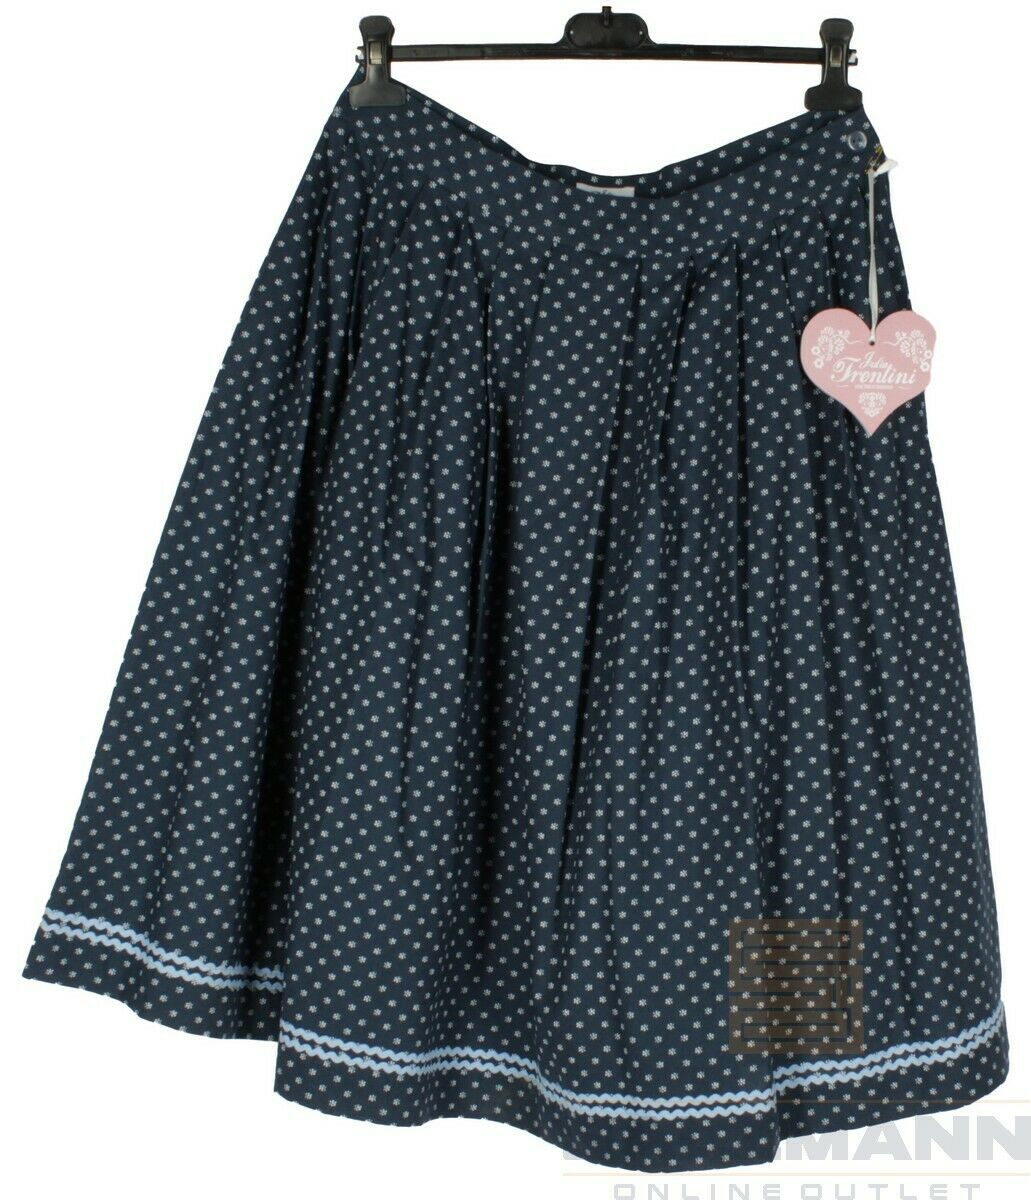 Julia Trentini Fritzi Ladies Trachten Skirt Size 42 Blue NEW